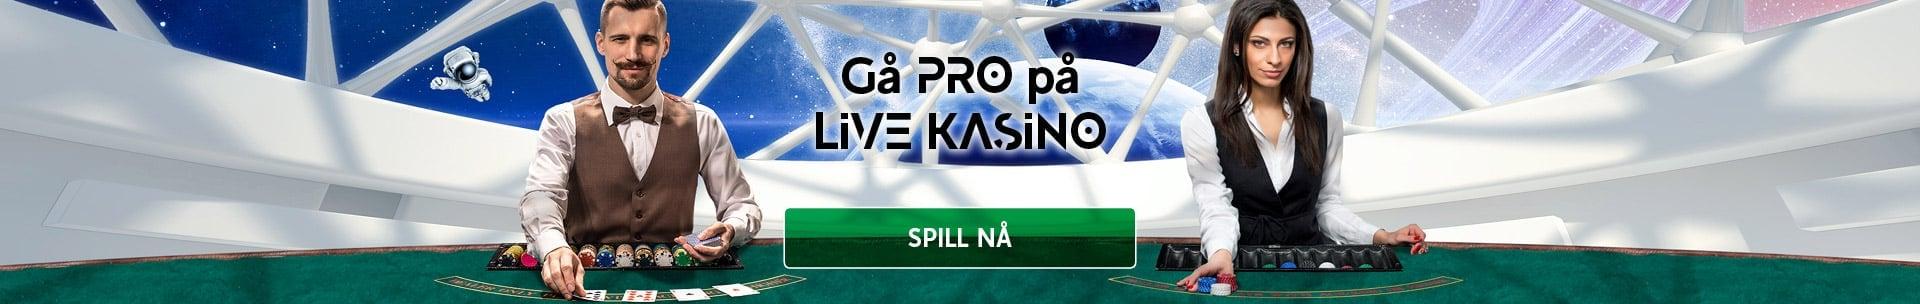 GoProCasino Content Images 02 - Norway CasinoTop